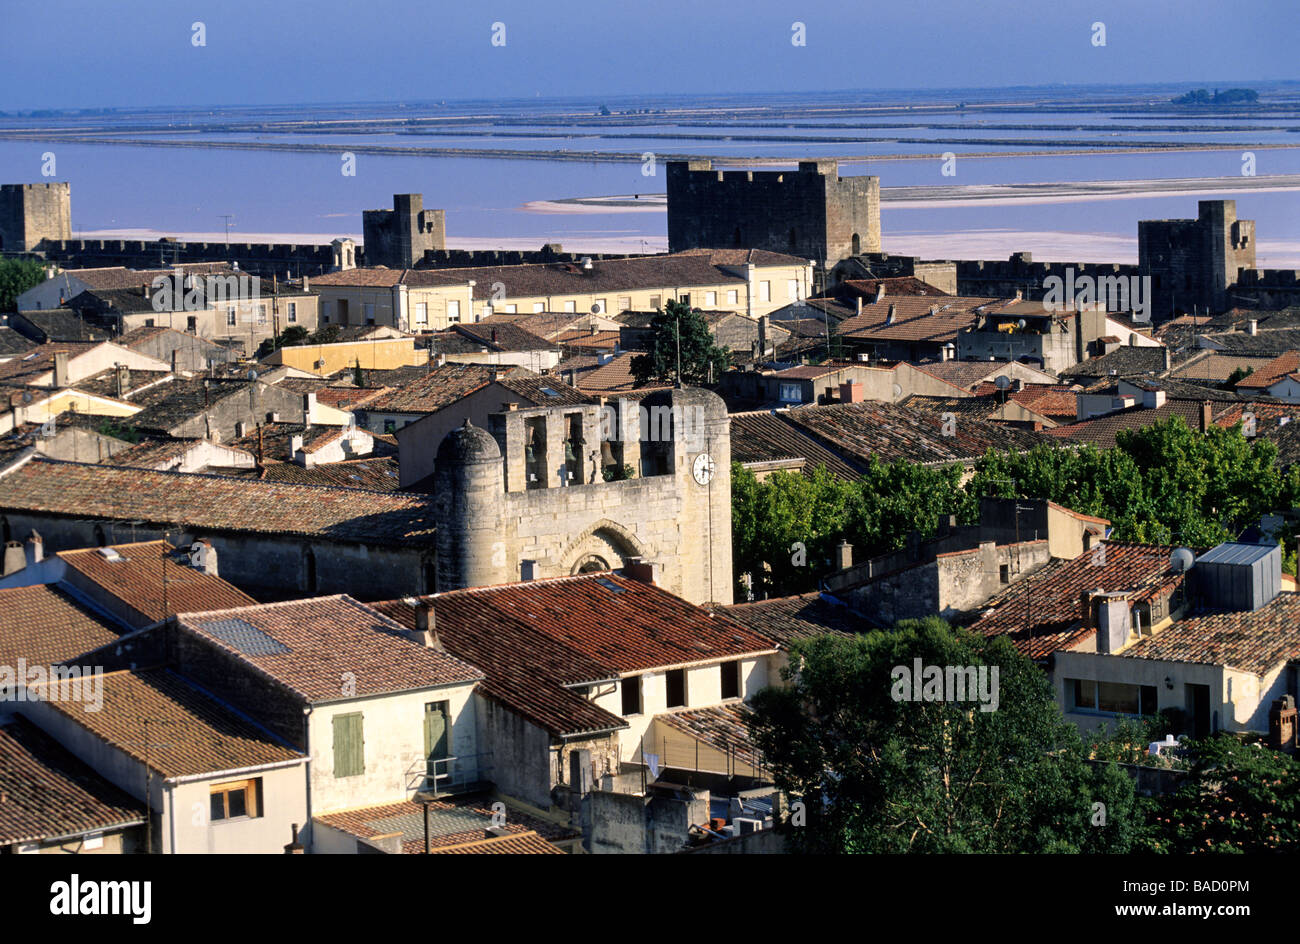 France, Gard, Aigues Mortes - Stock Image